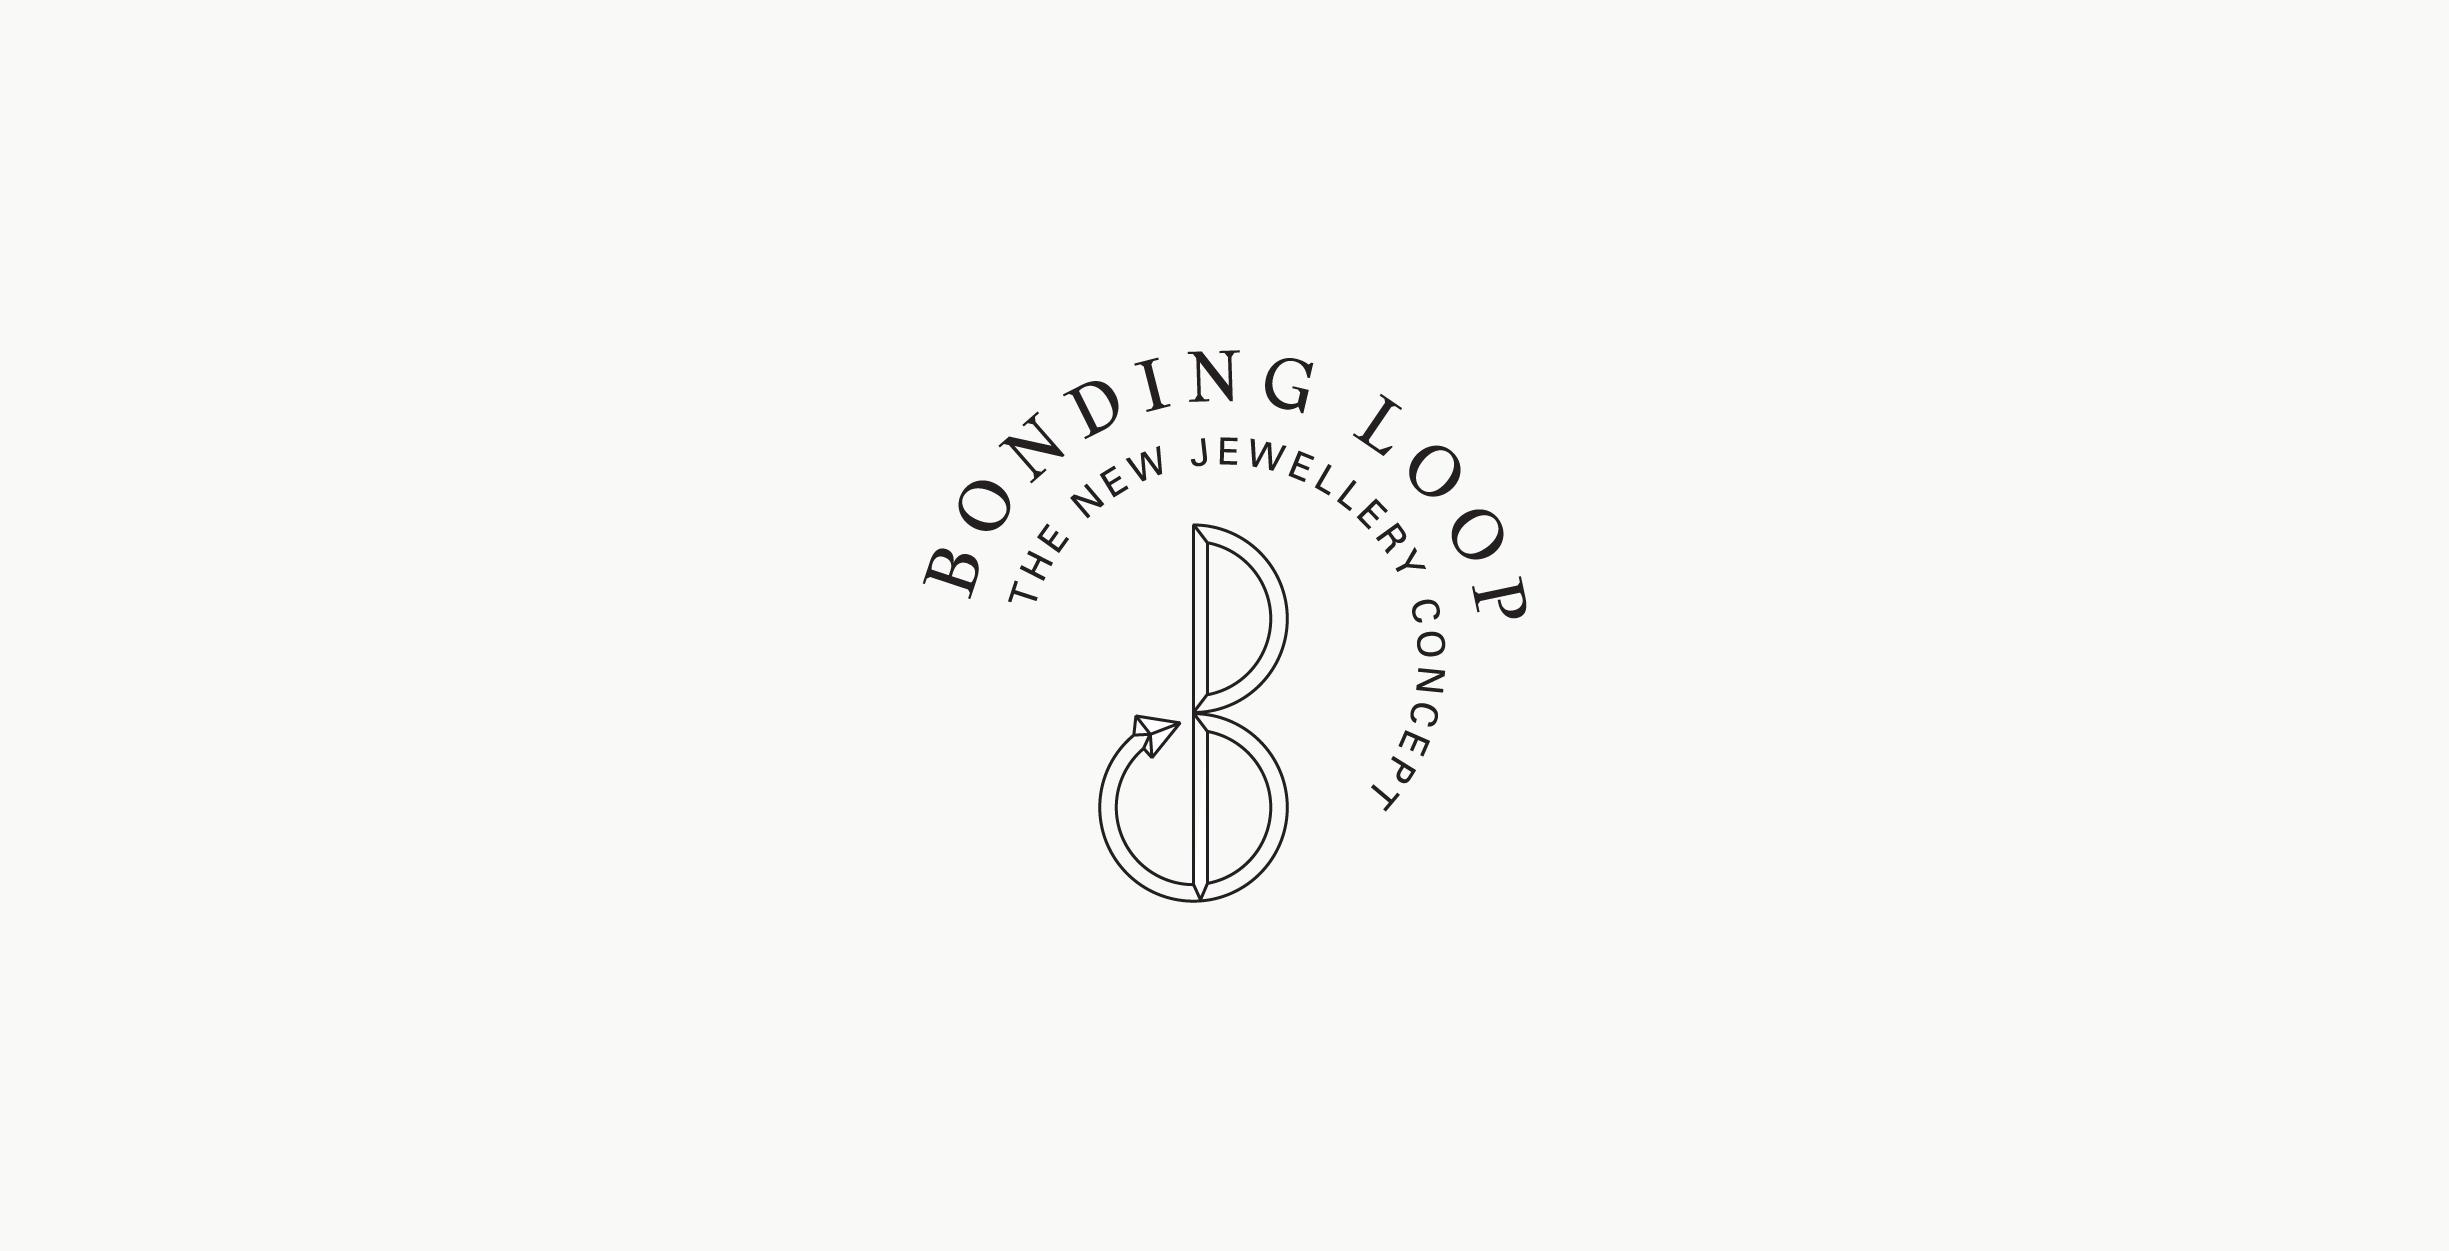 logos-2-v4-09